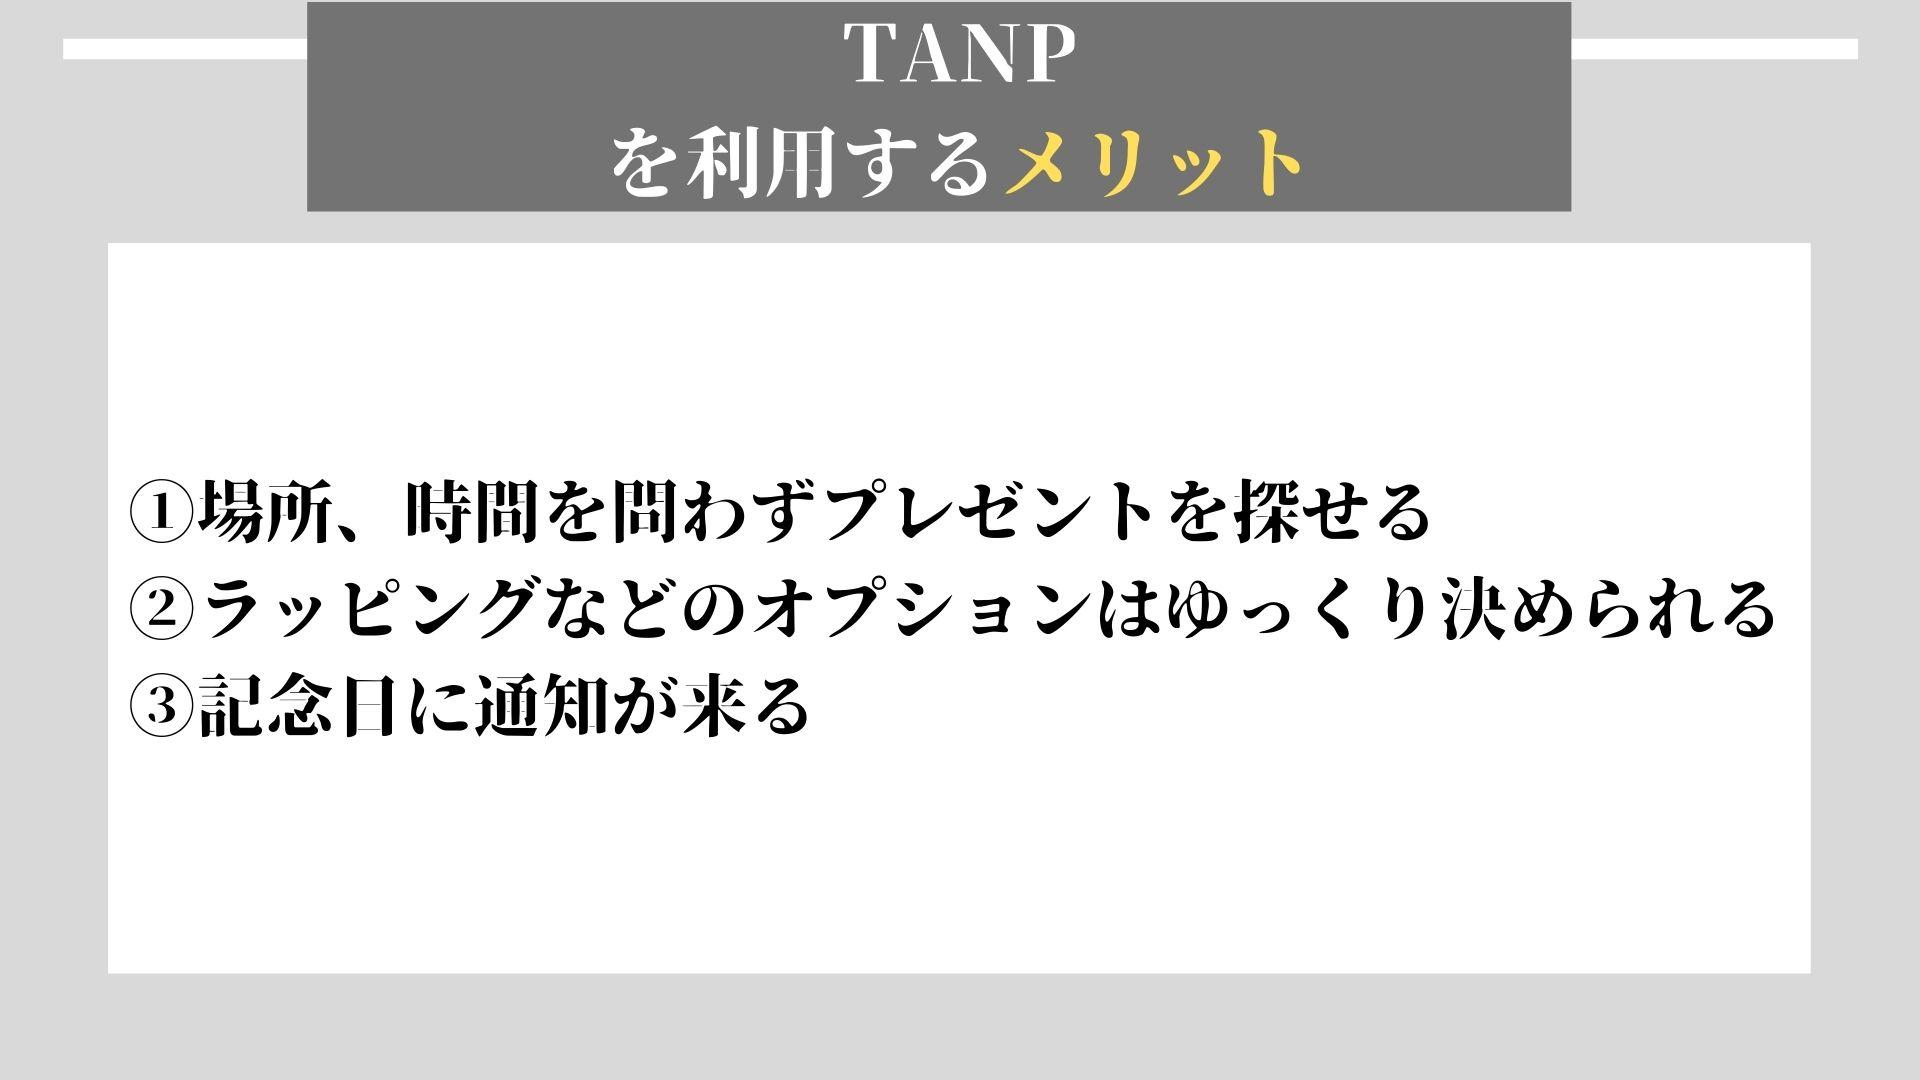 TANP メリット